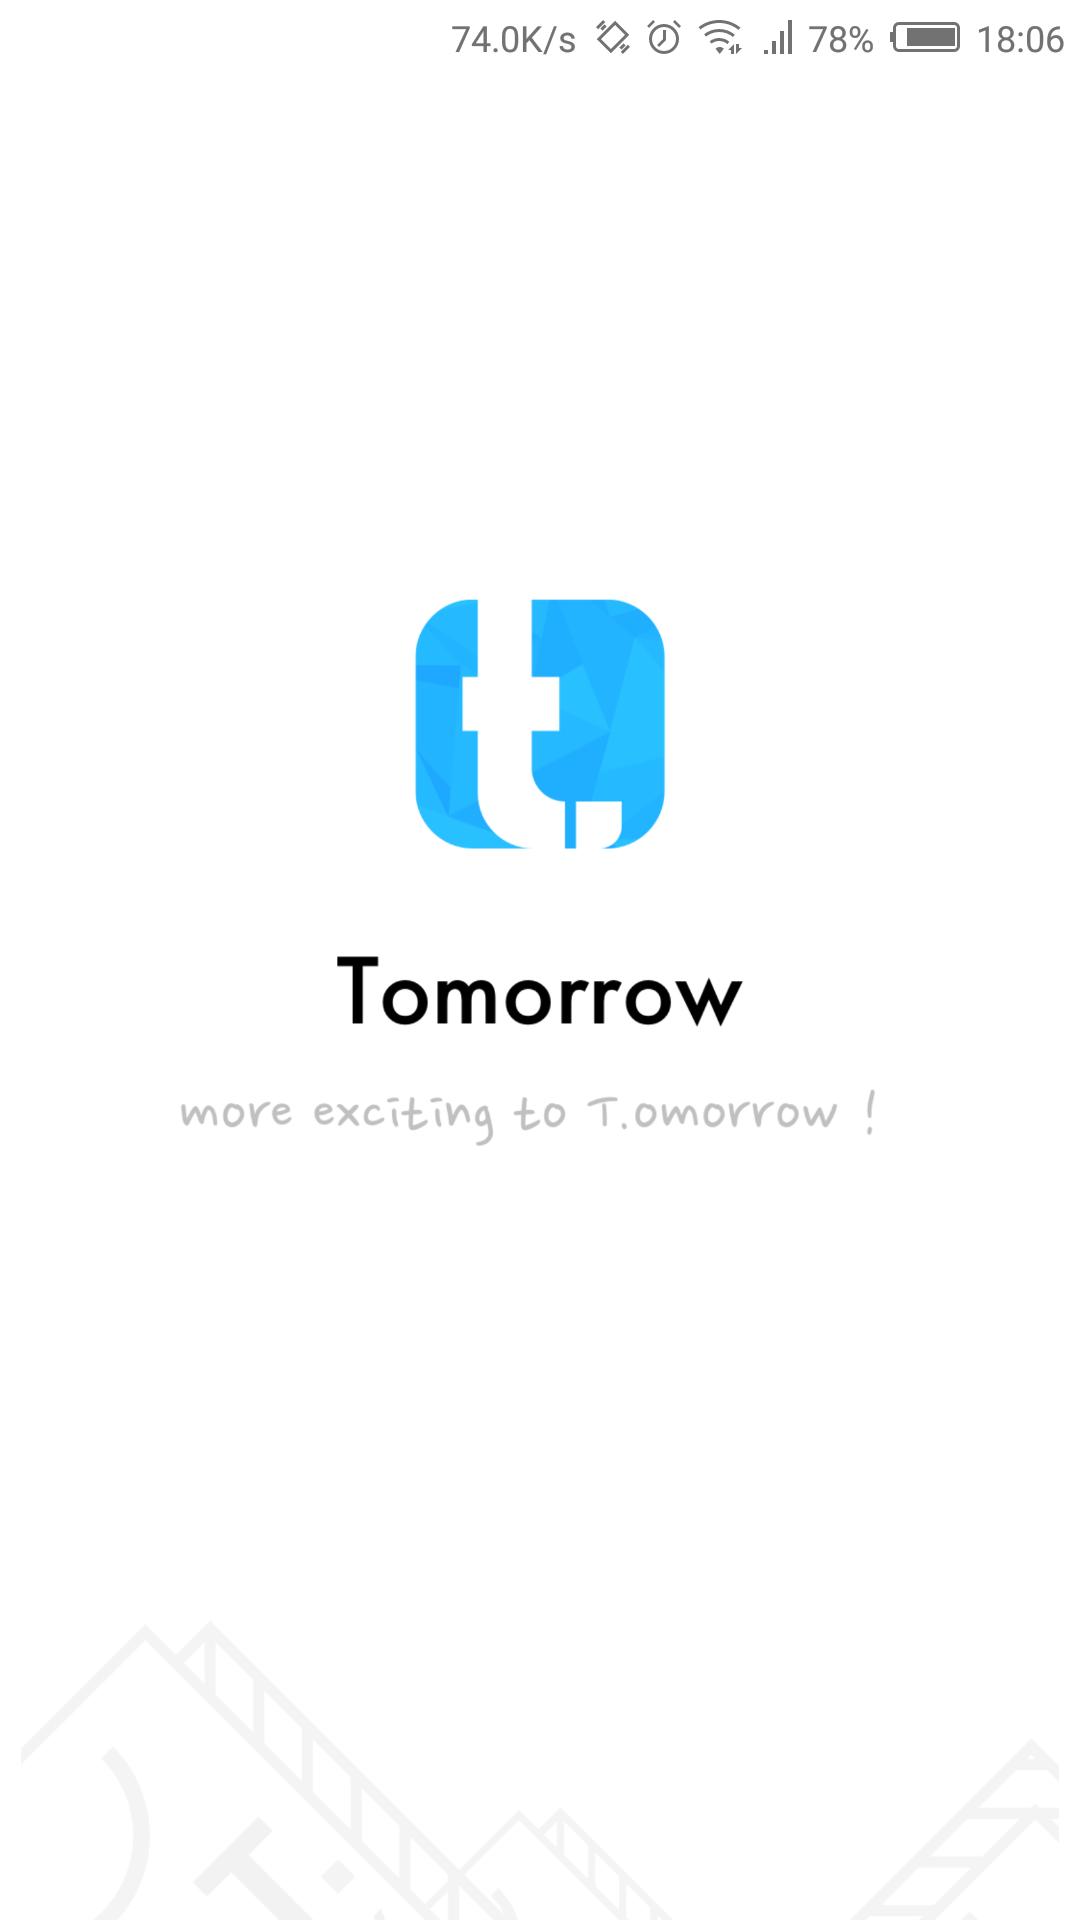 Tomorrow国际海淘